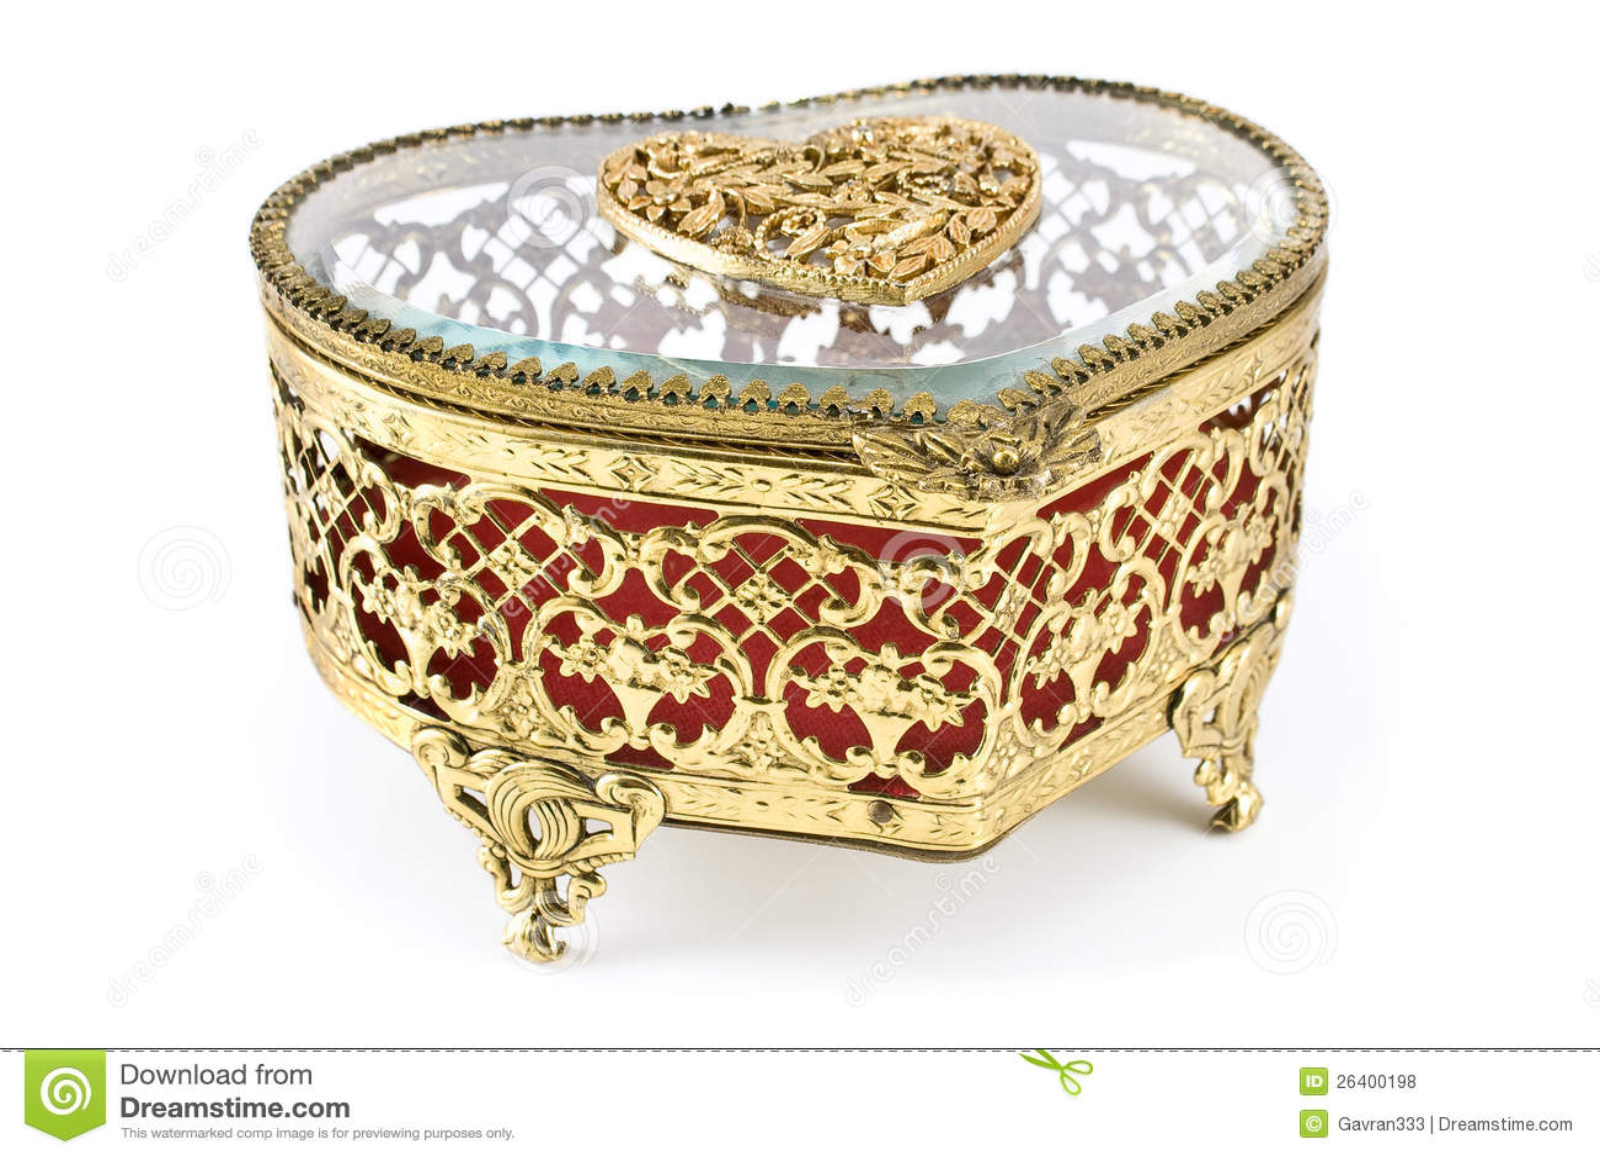 jewelry box plans free image